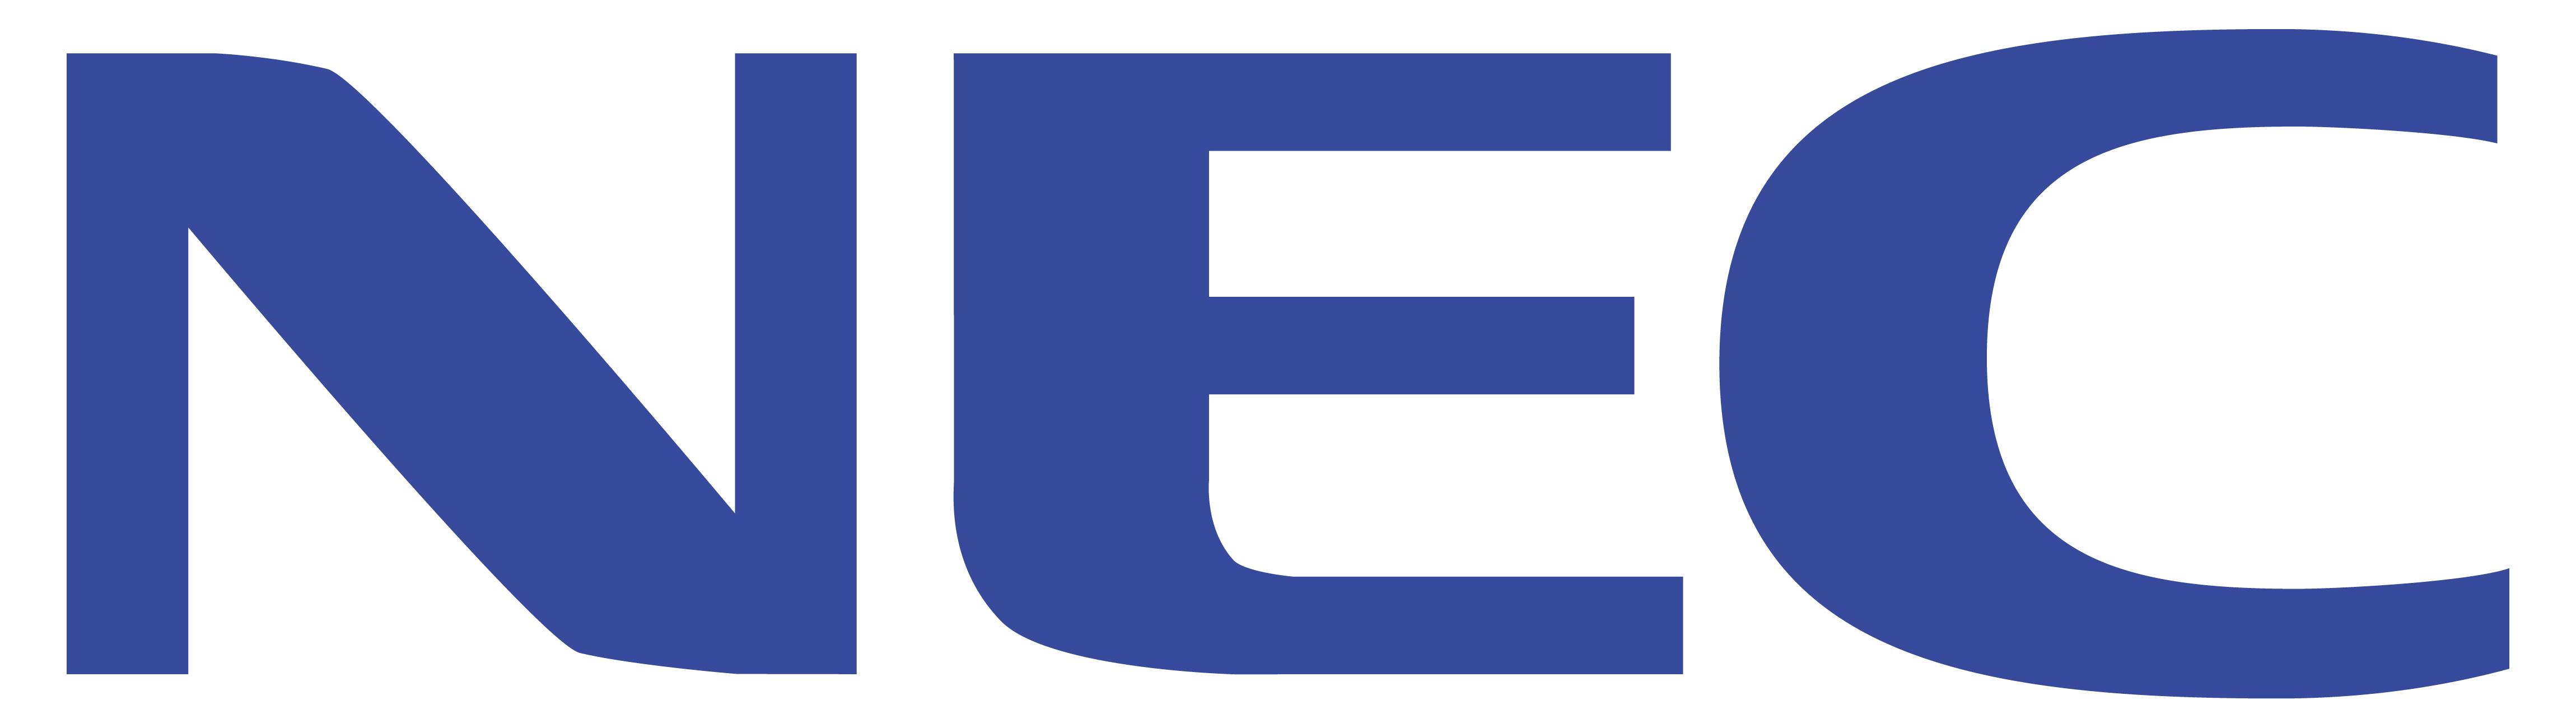 NEC_logo.jpeg